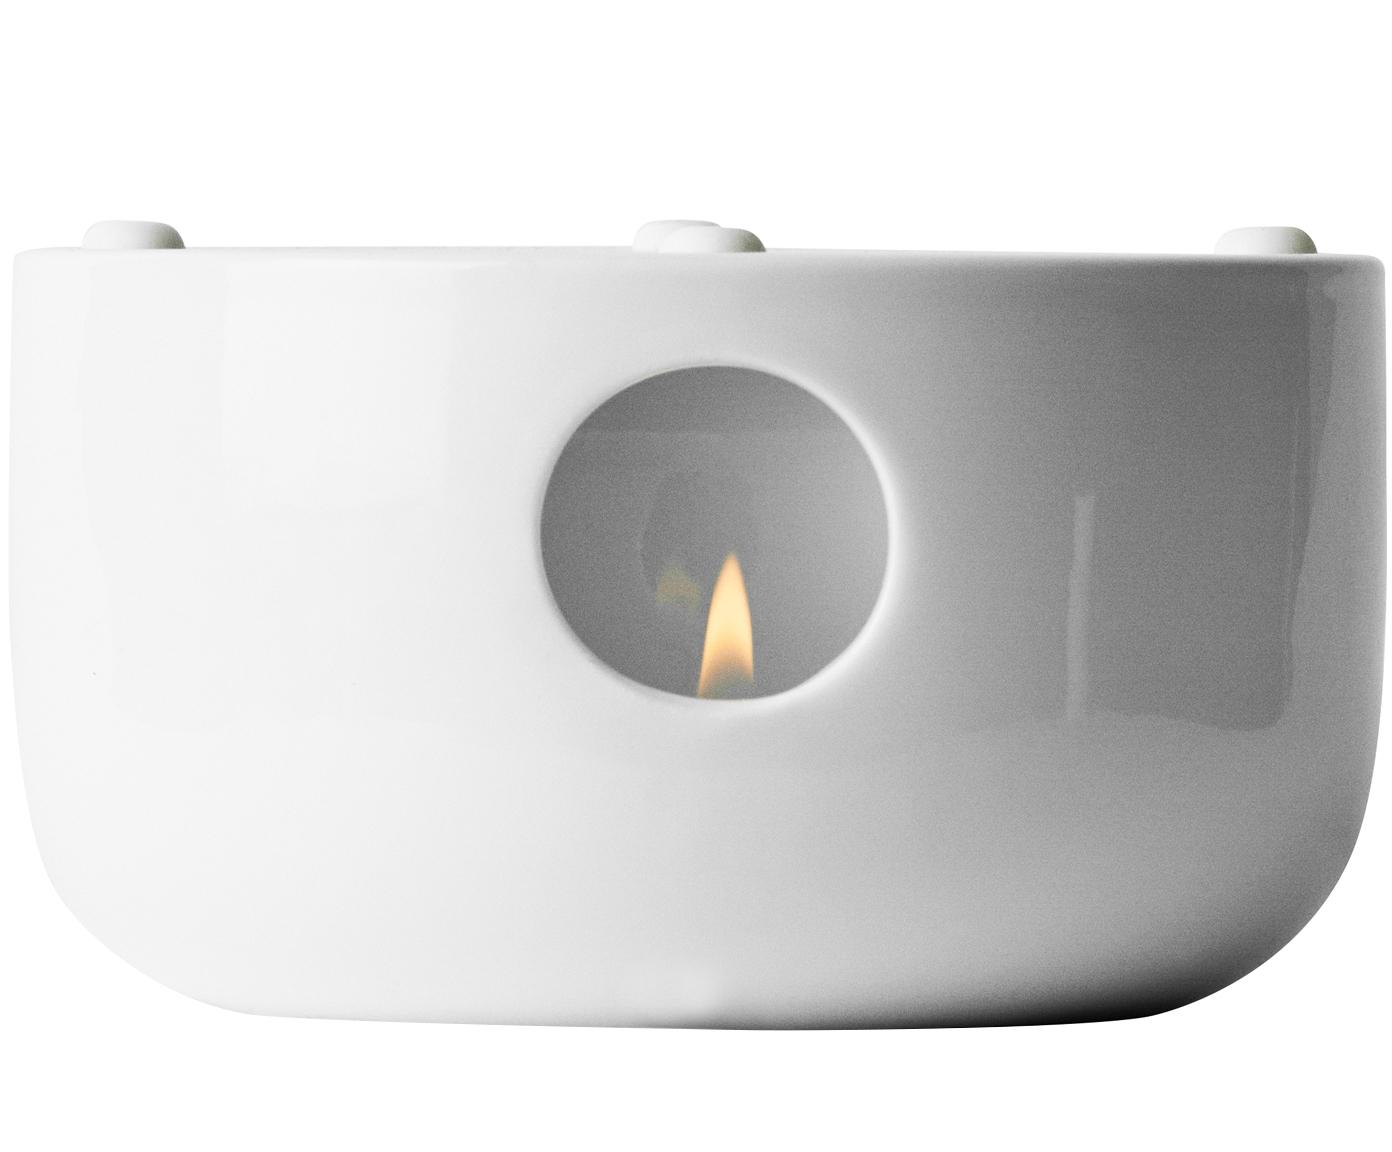 Stövchen Kettle, Porzellan, Silikon, Transparent,Weiß, Ø 14 x H 7 cm